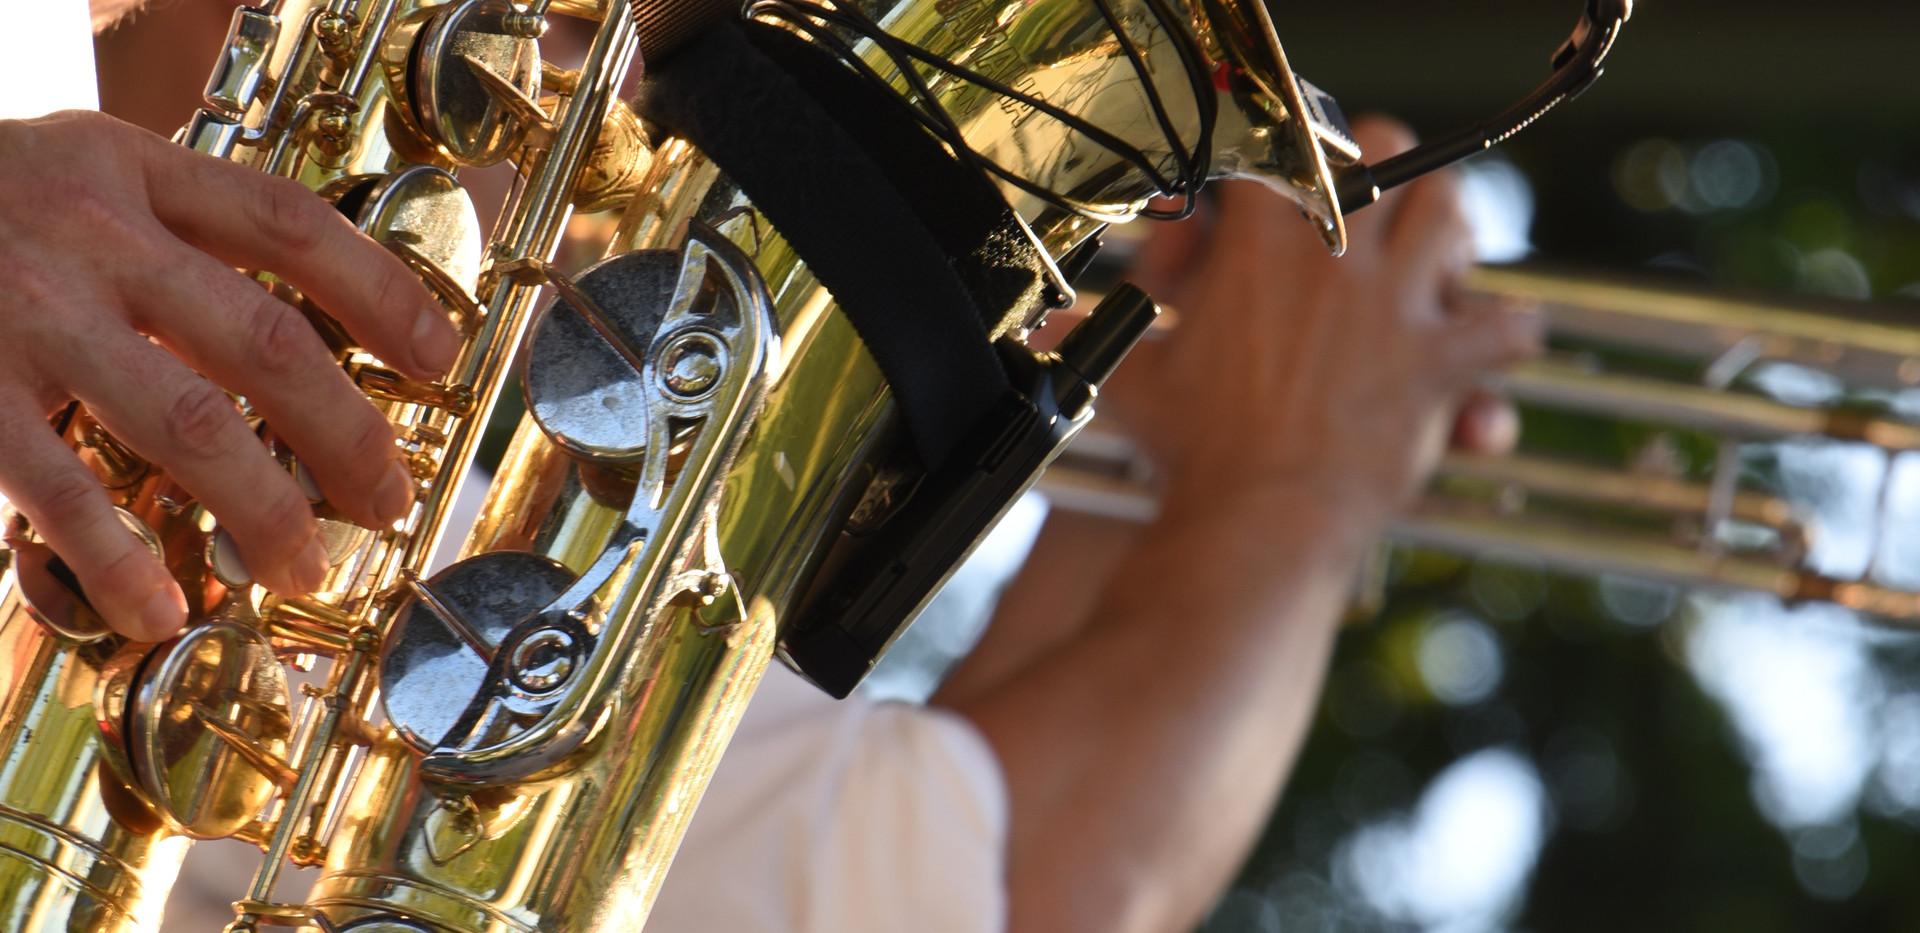 Havana NRG horns close up